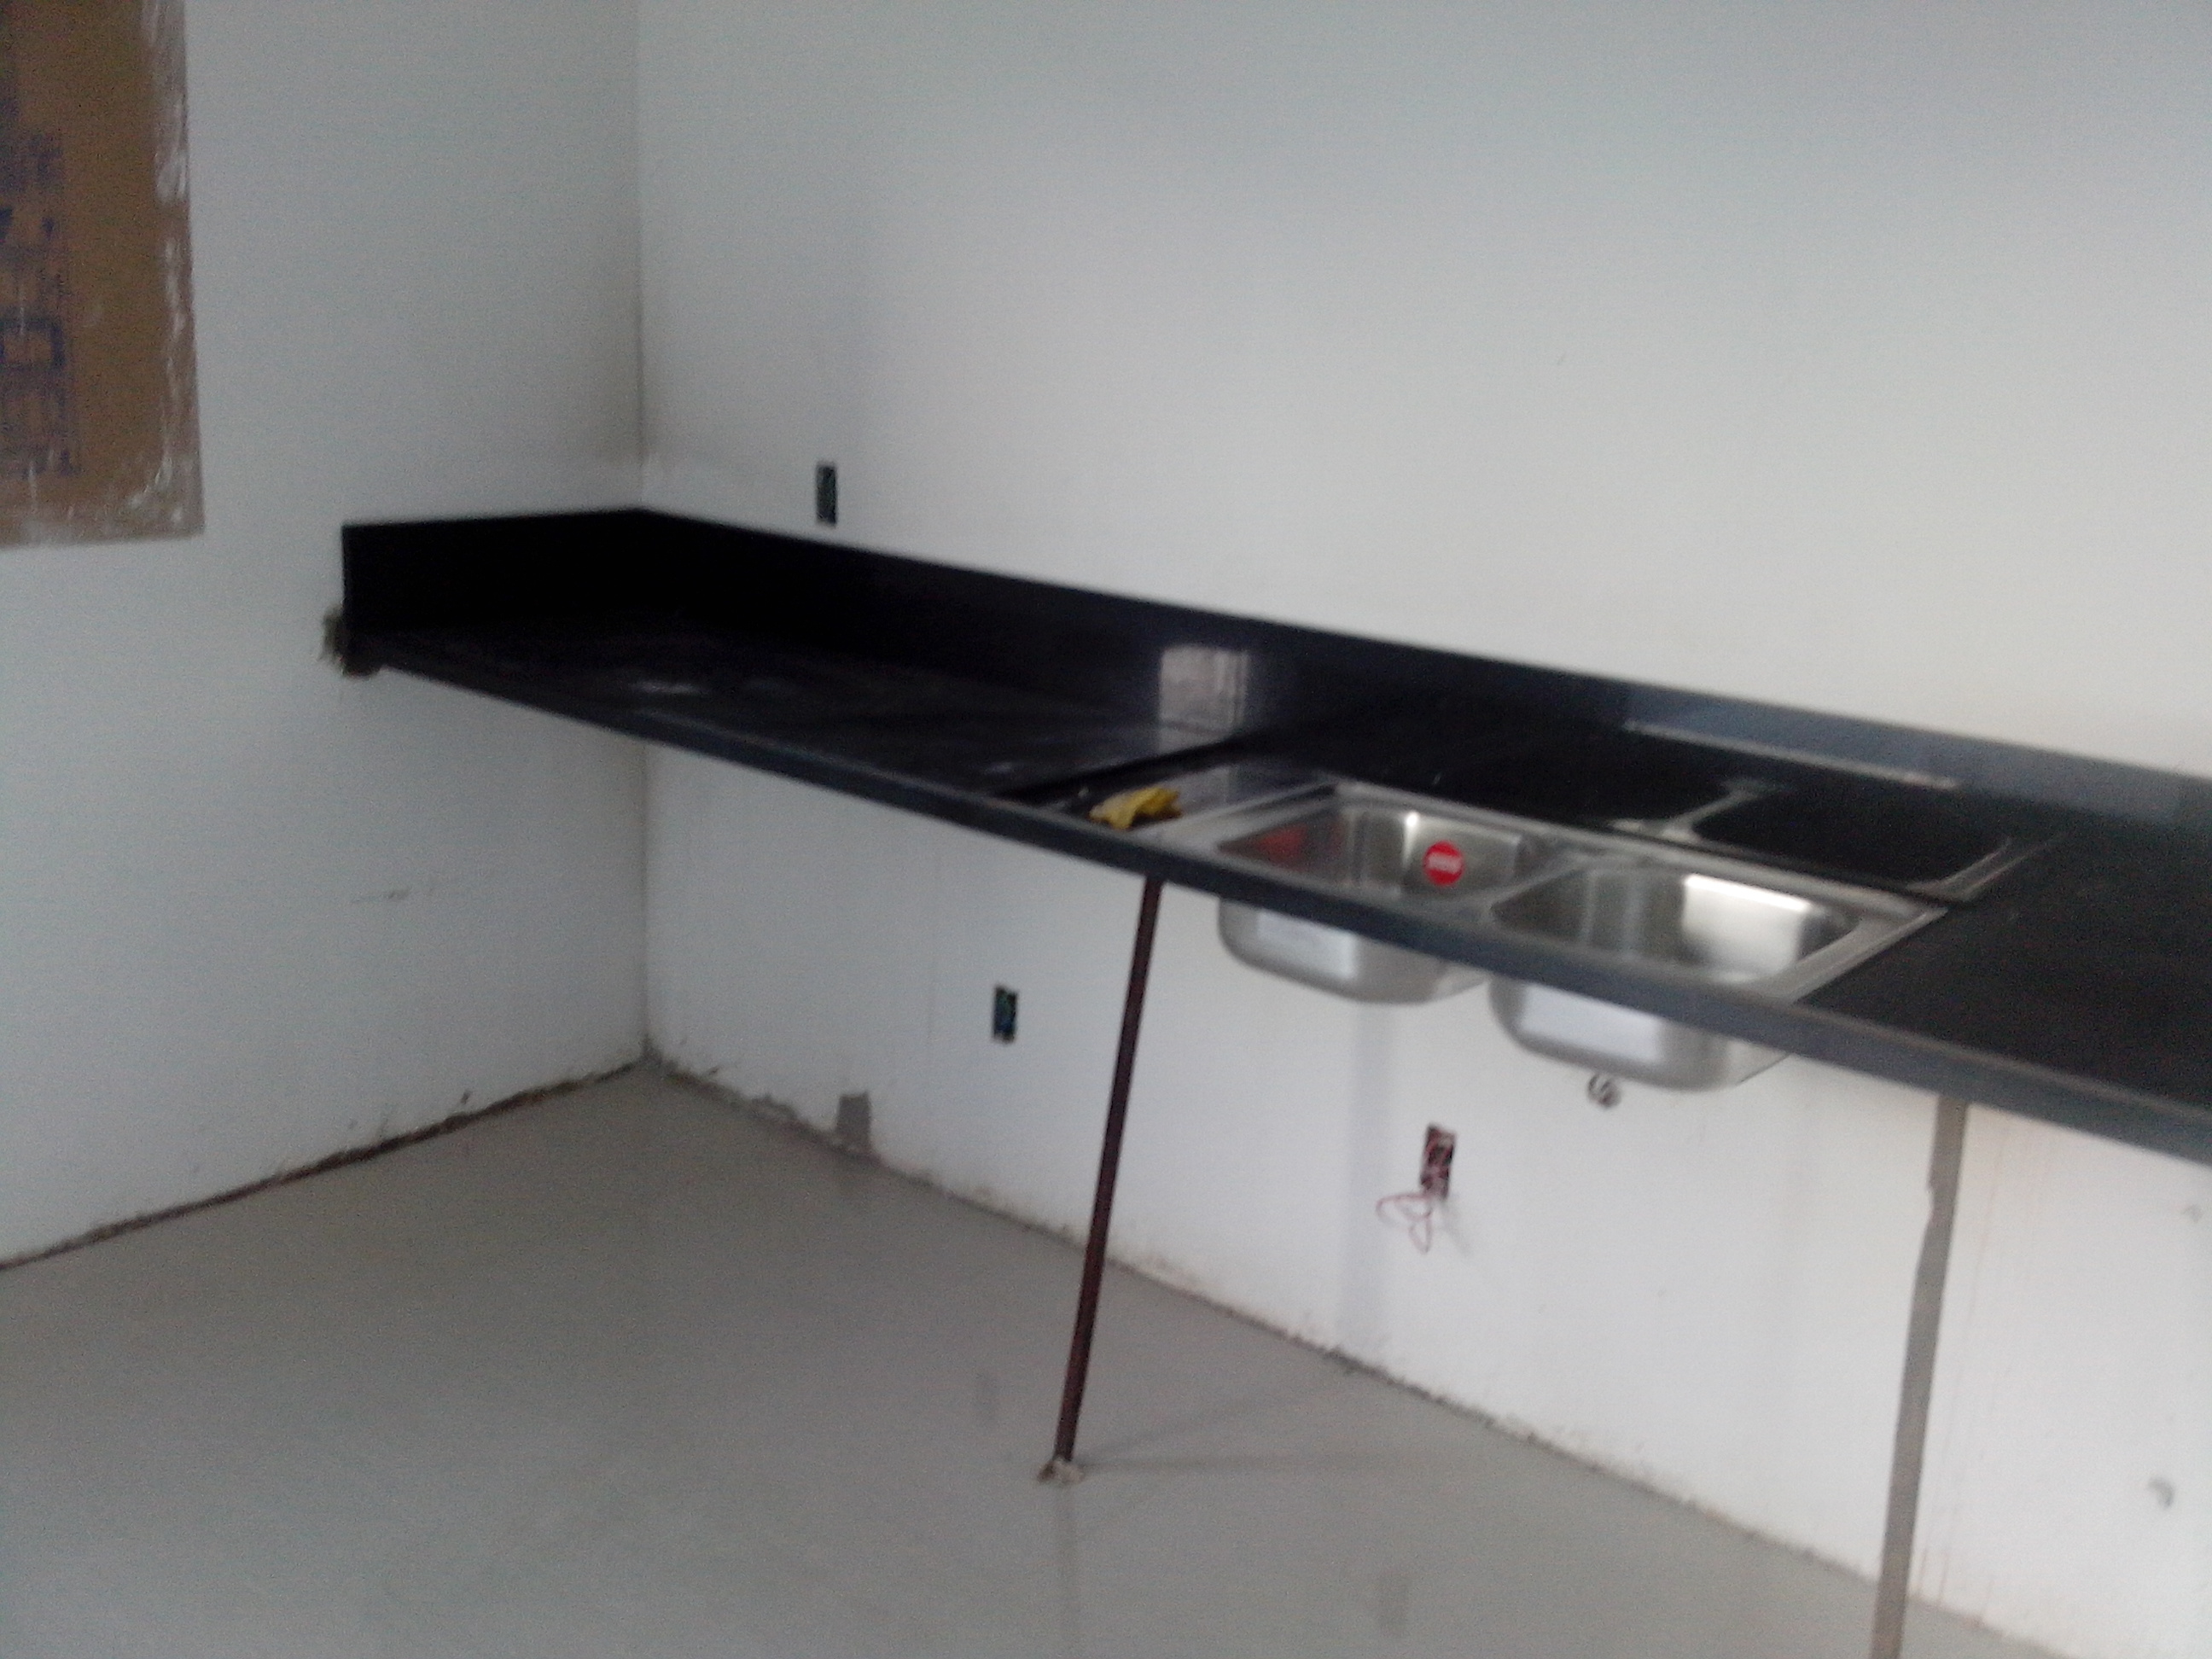 Pin Granito Paulo Pias Lavatorios Bancadas Granitos Ajilbabcom Portal on Pint -> Como Instalar Pia De Banheiro Suspensa